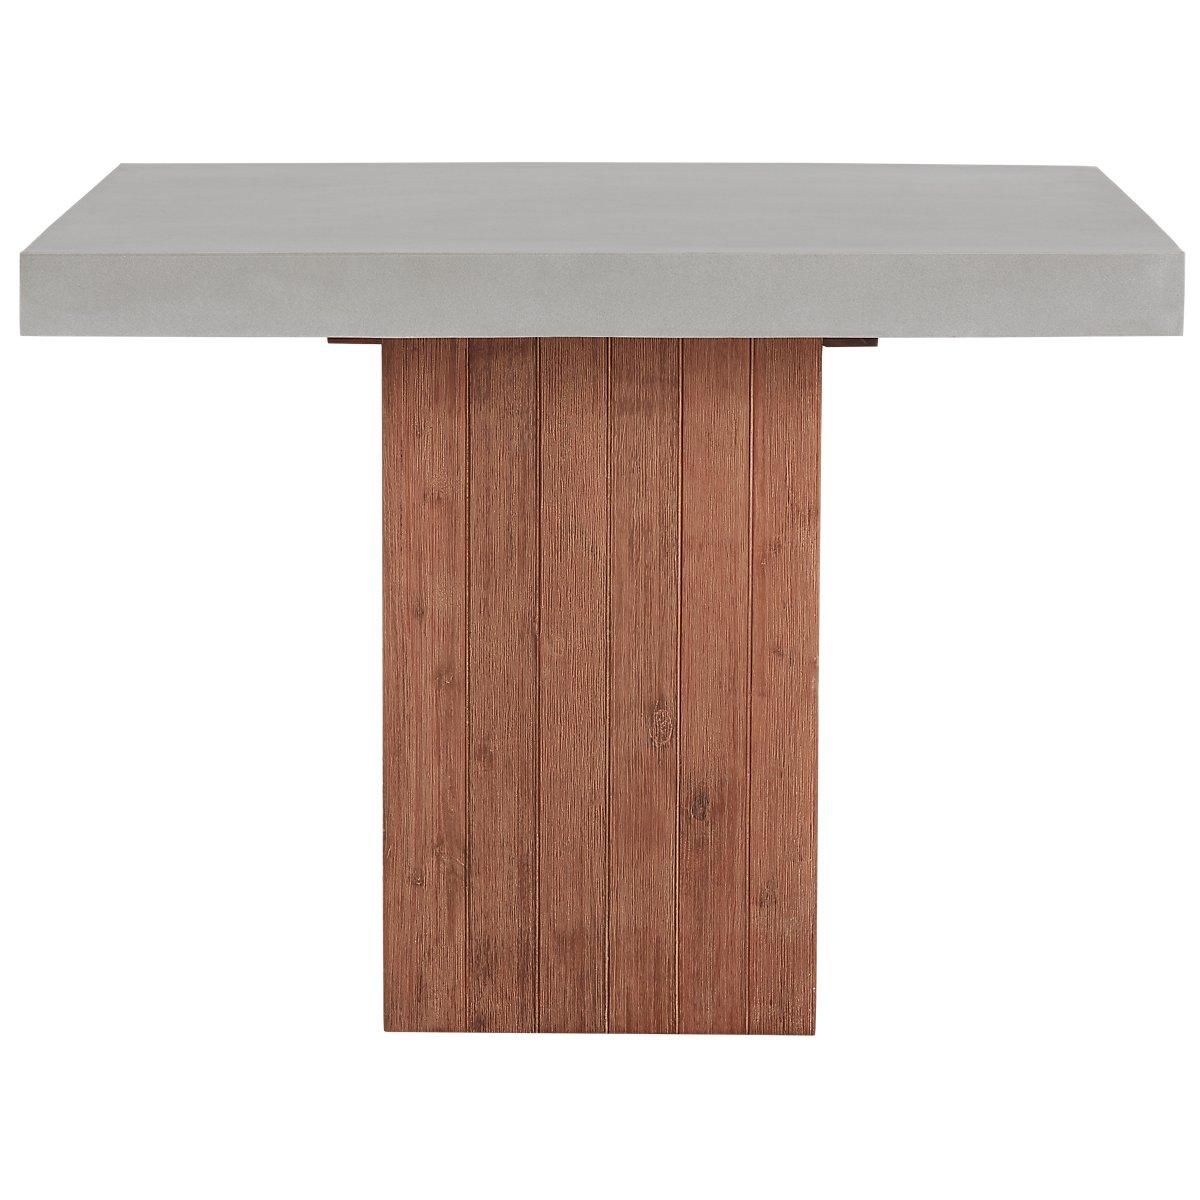 Square table furniture - Sydney Concrete Square Table